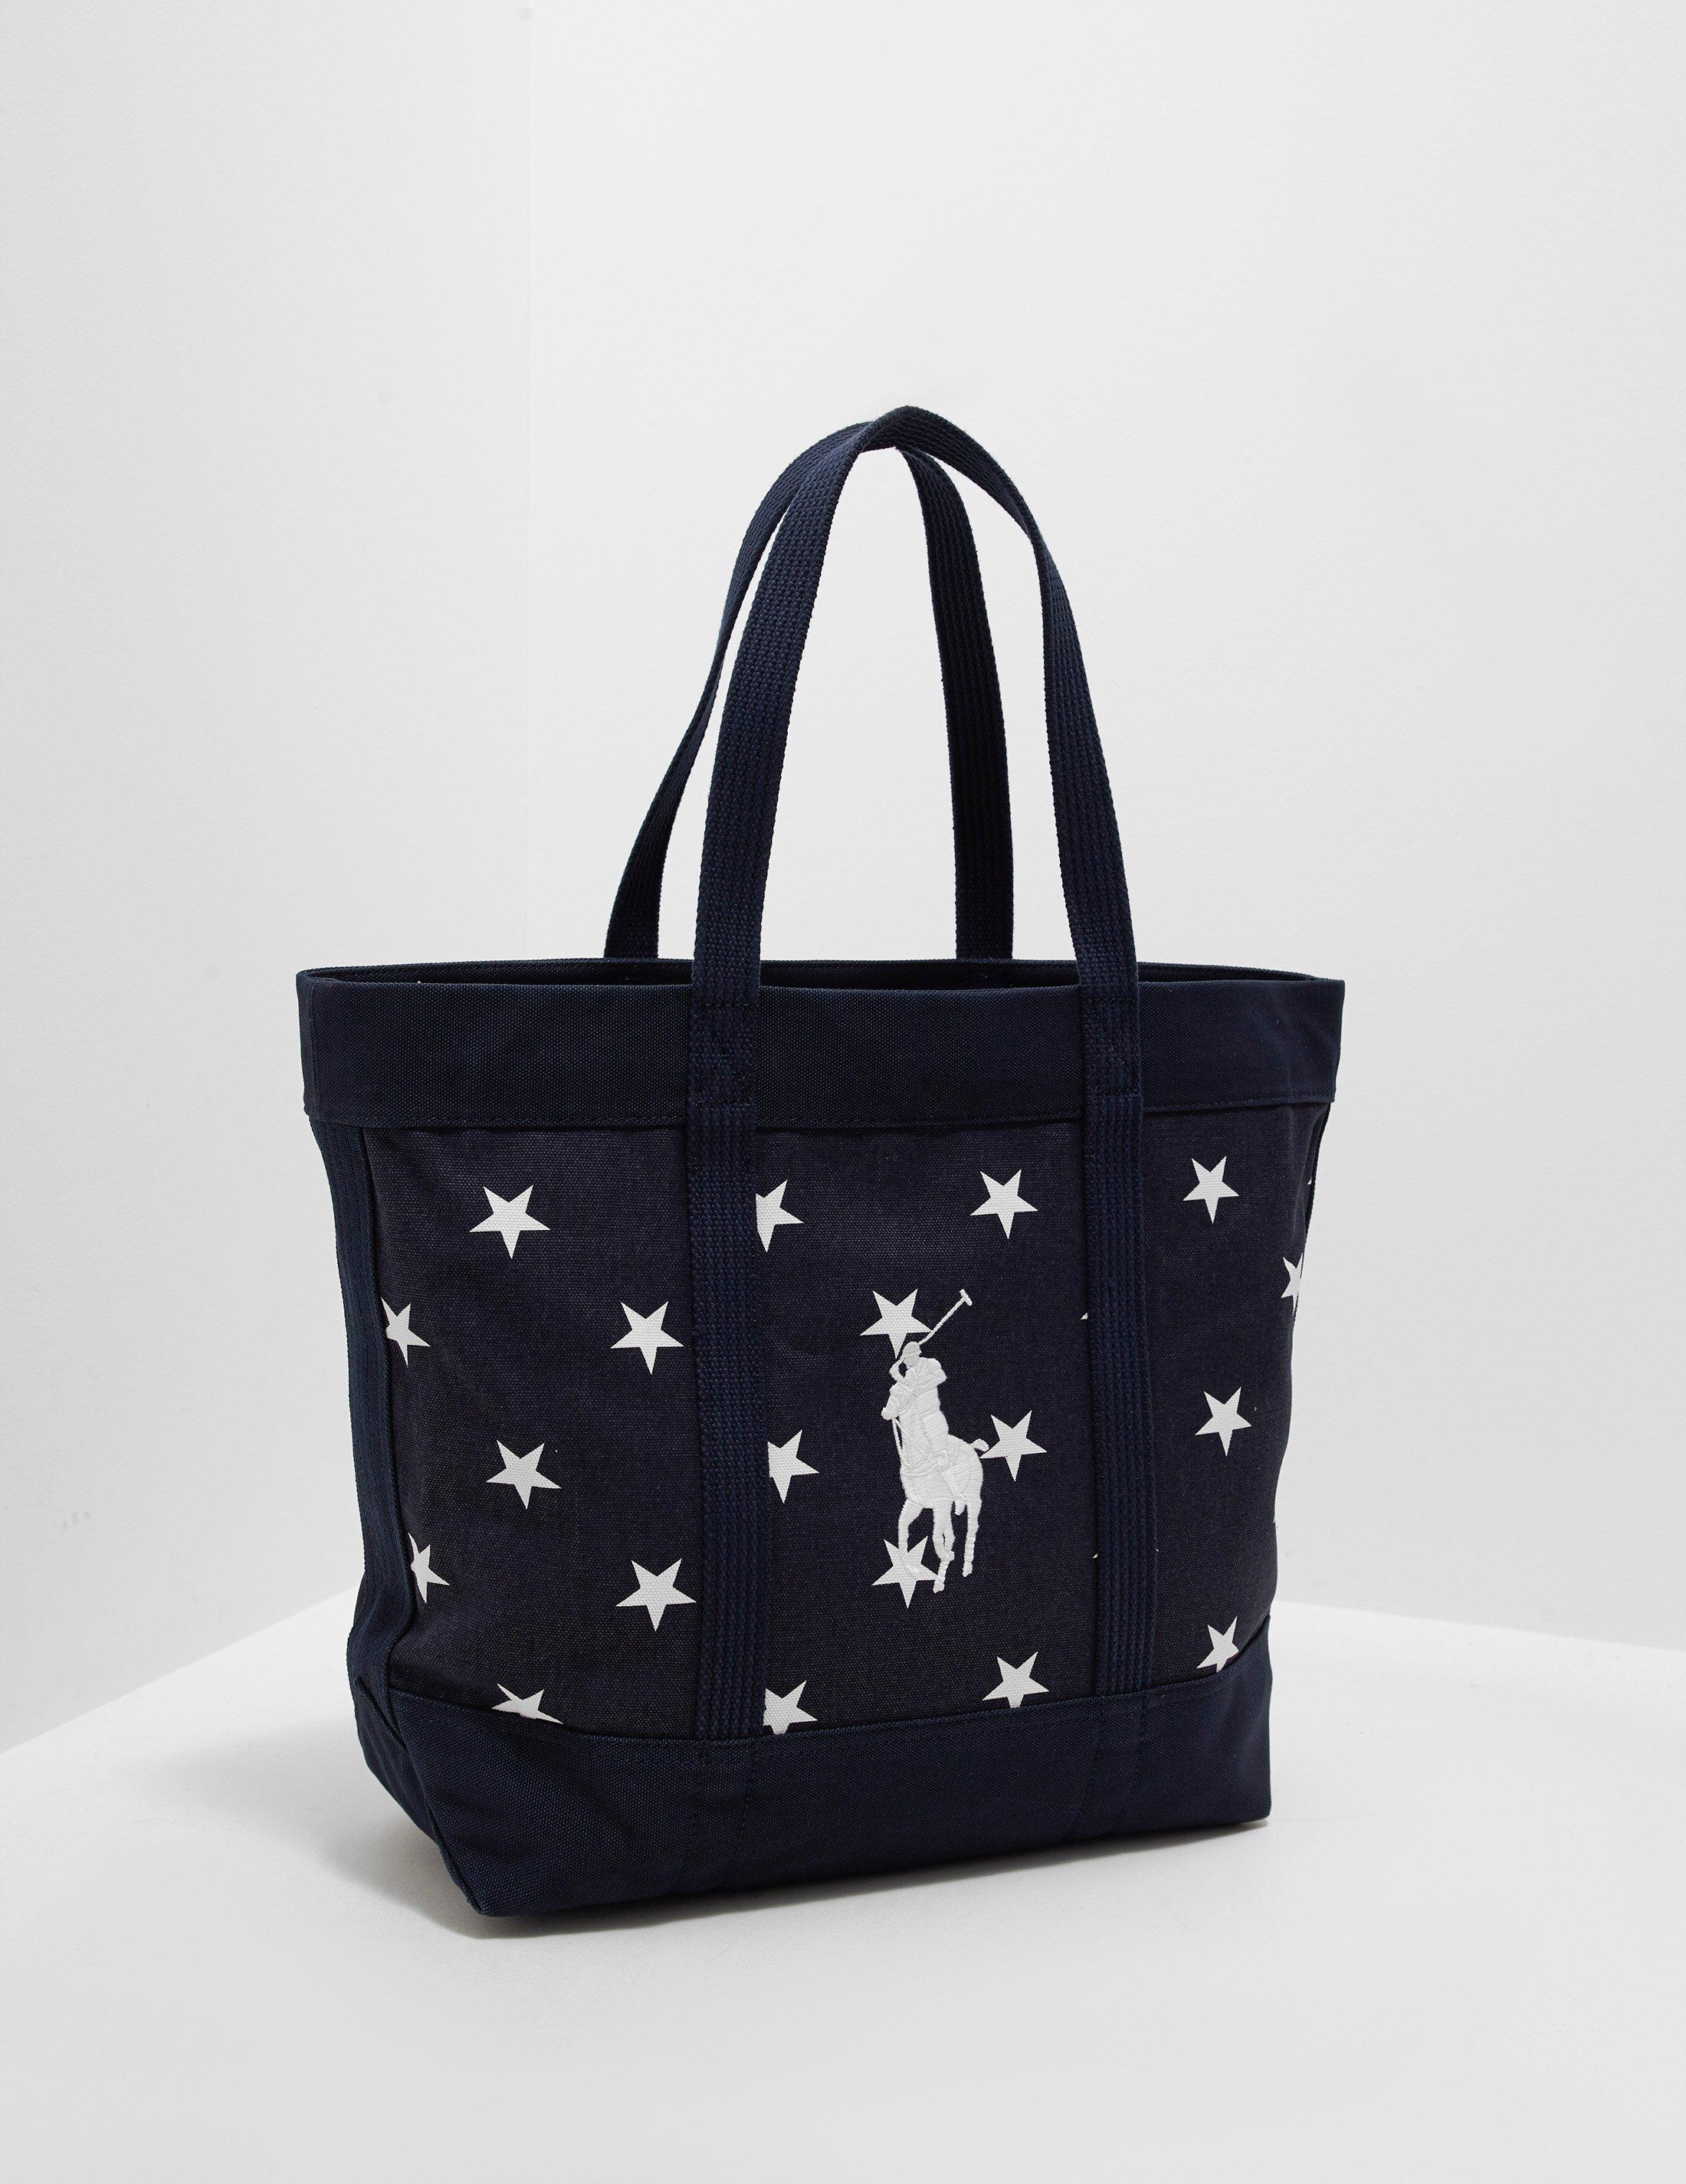 Polo Ralph Lauren Mens Stars Tote Bag - Online Exclusive Navy Blue ... 38bedc9eb8c95